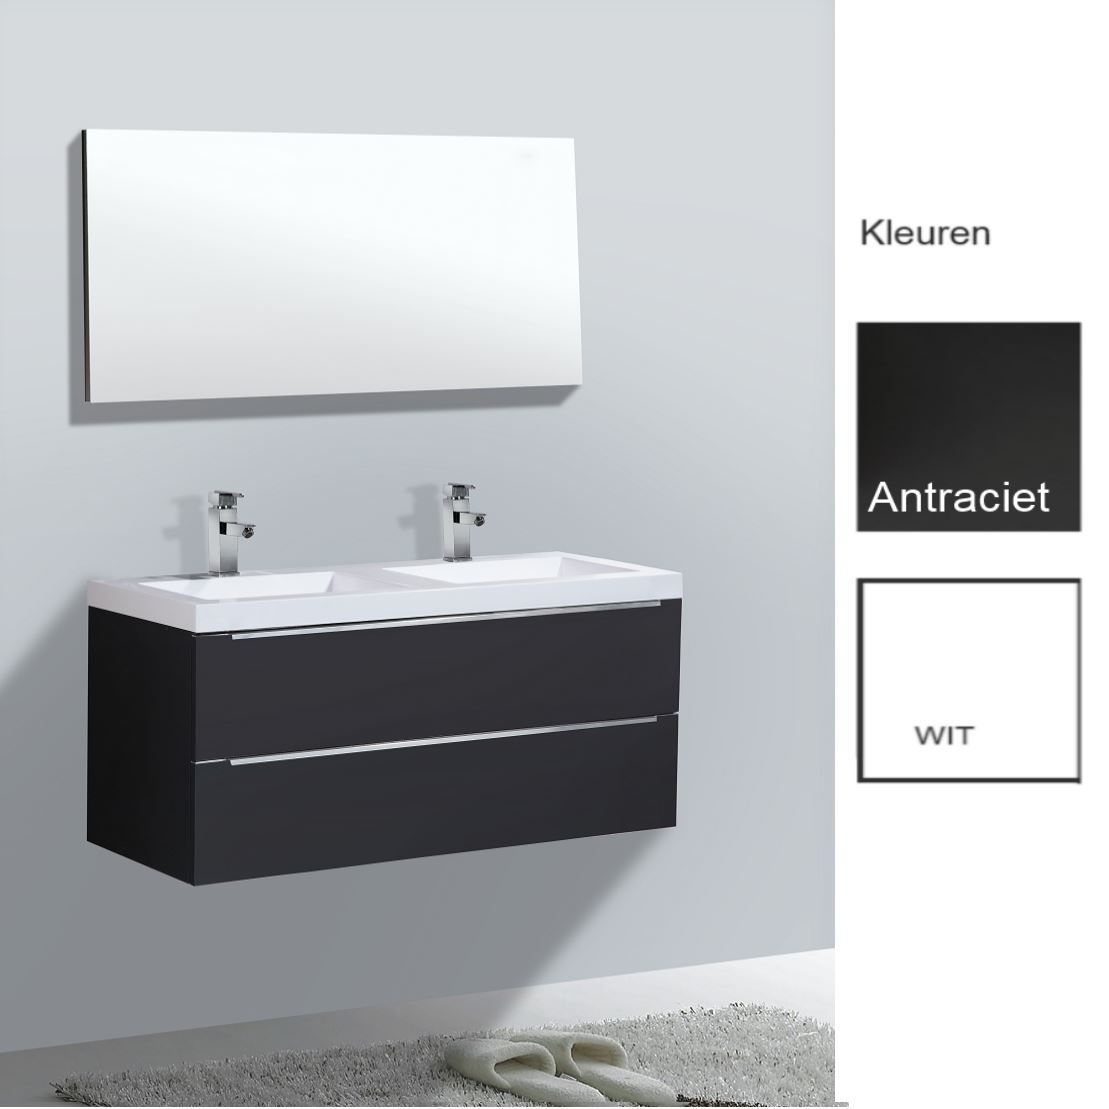 Badkamermeubels Wastafelonderkast kopen? Badkamermeubelset Sanilux Senza 120x47x50 cm (in twee kleuren leverbaar) met korting